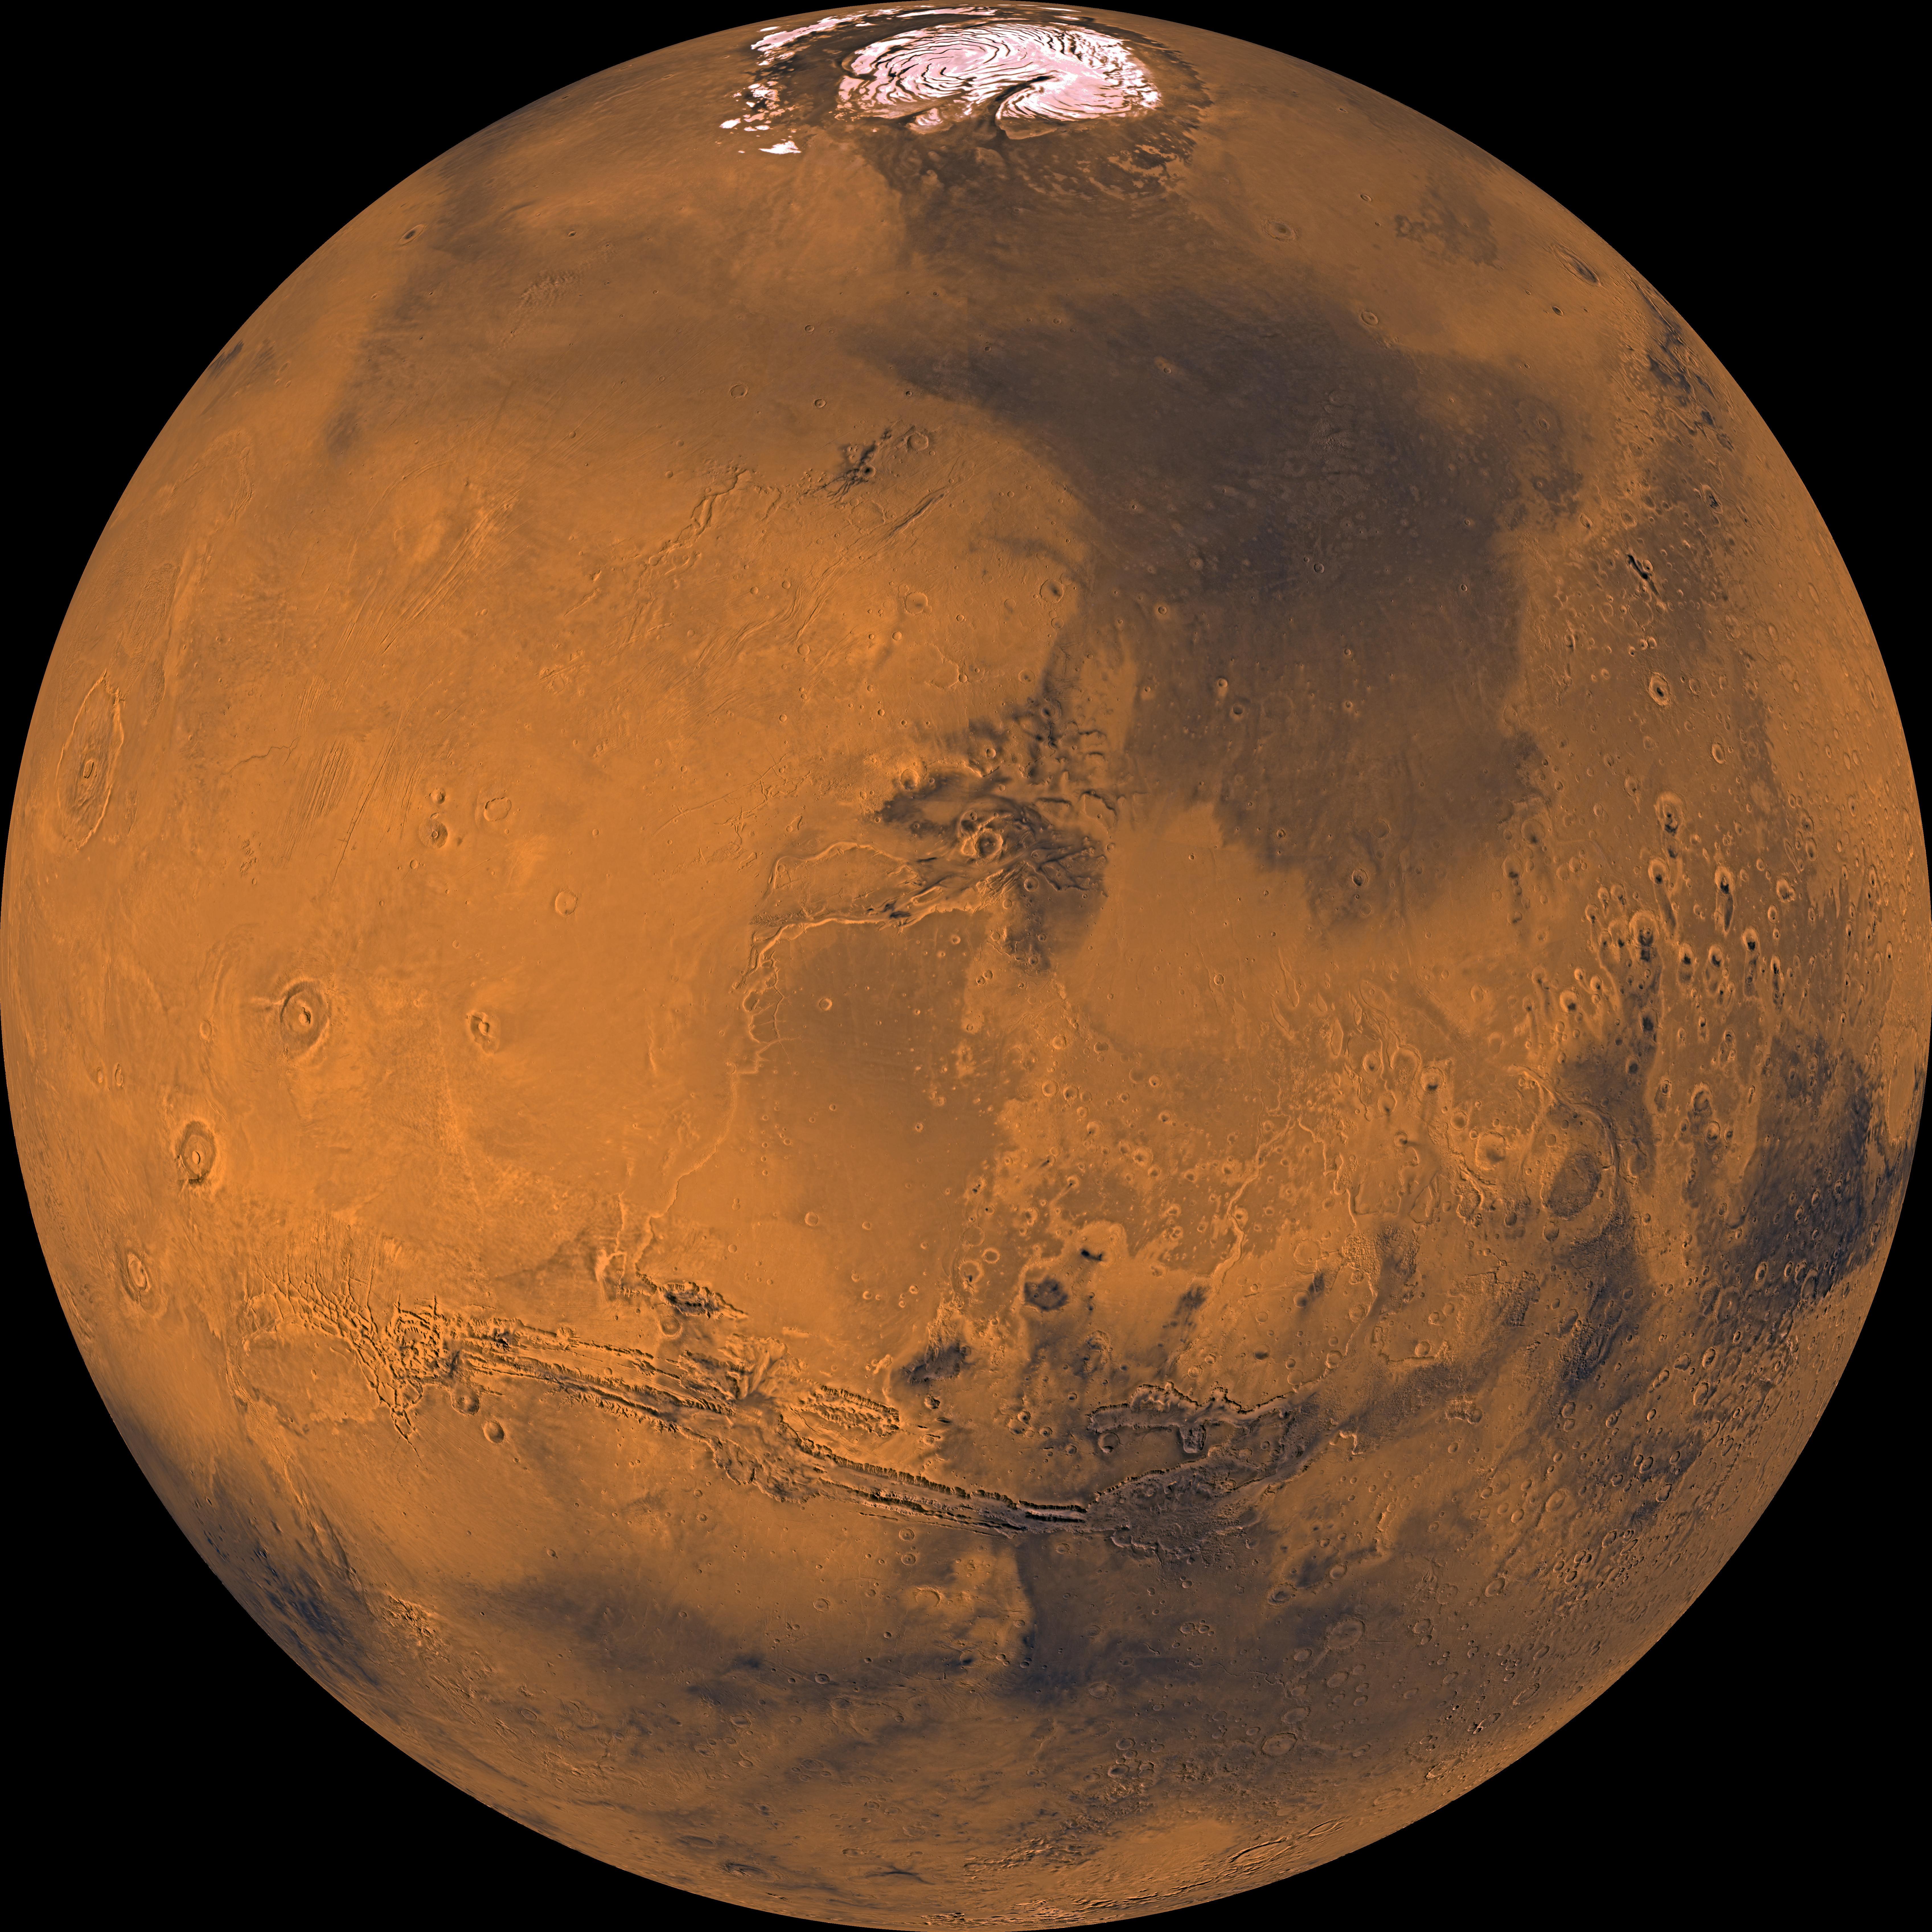 Mars As Seen by Viking 1